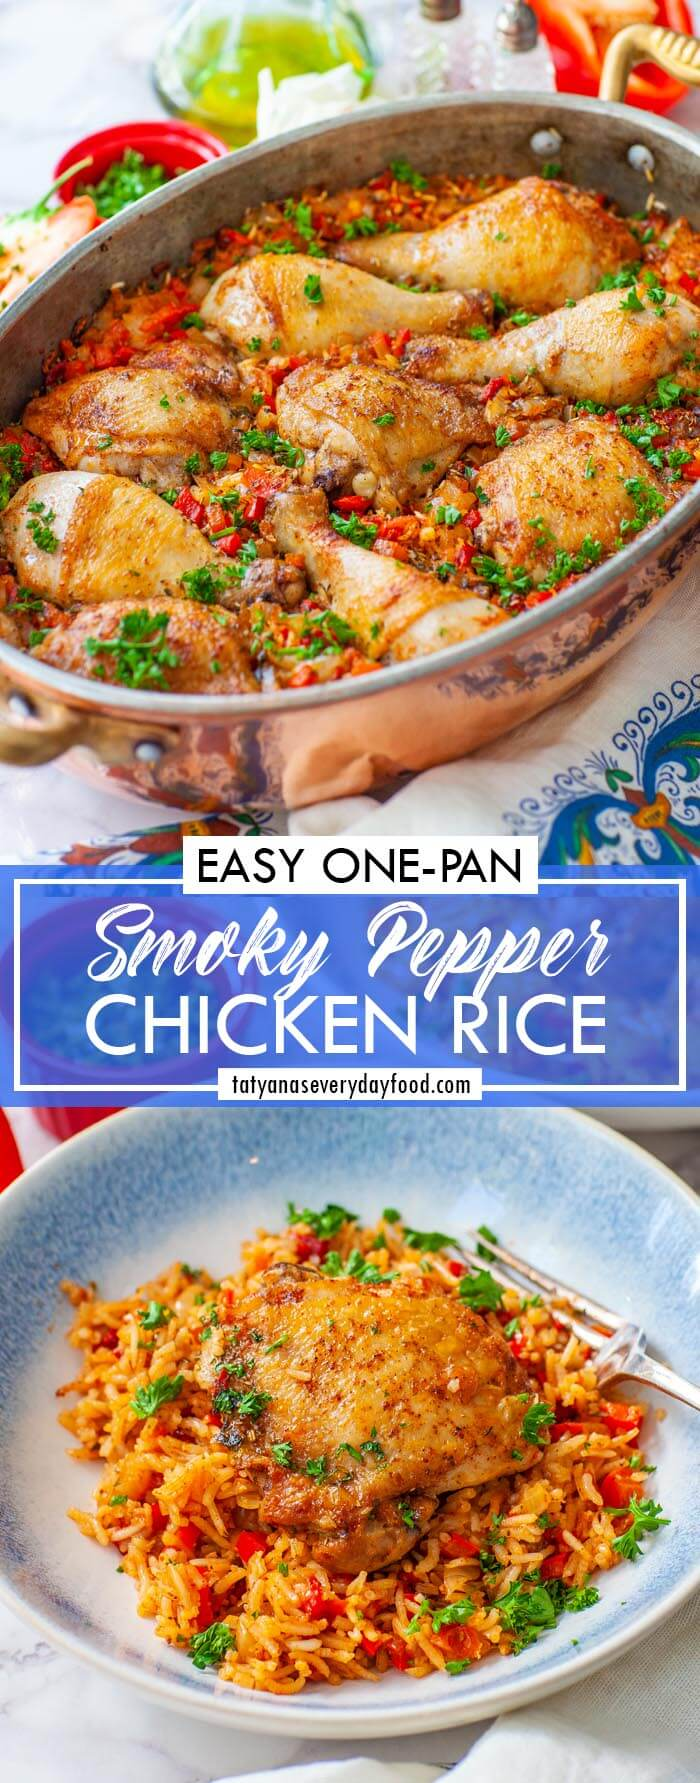 One-Pot Pepper & Chicken Rice video recipe